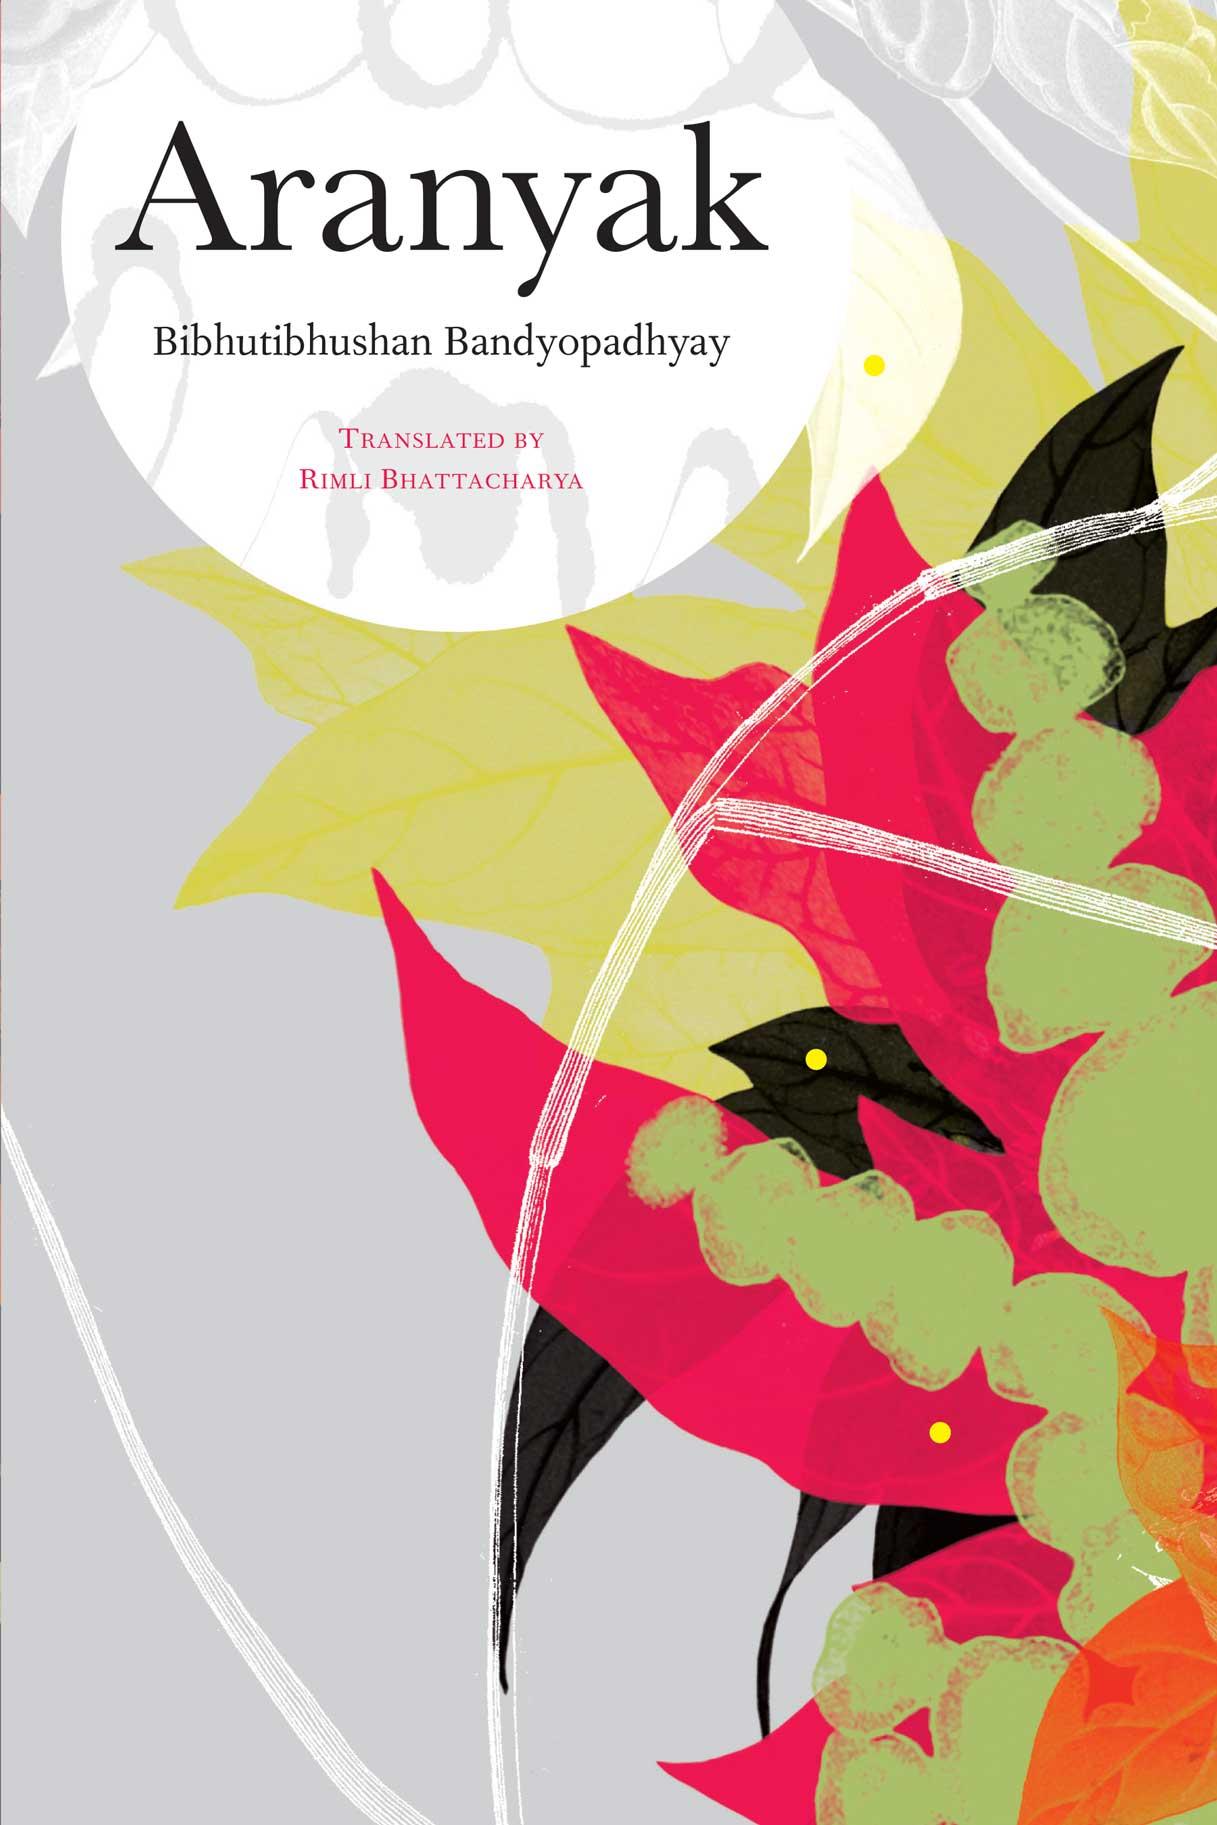 Aranyak by Bibhutibhushan Bandyopadhyay | Seagull Books